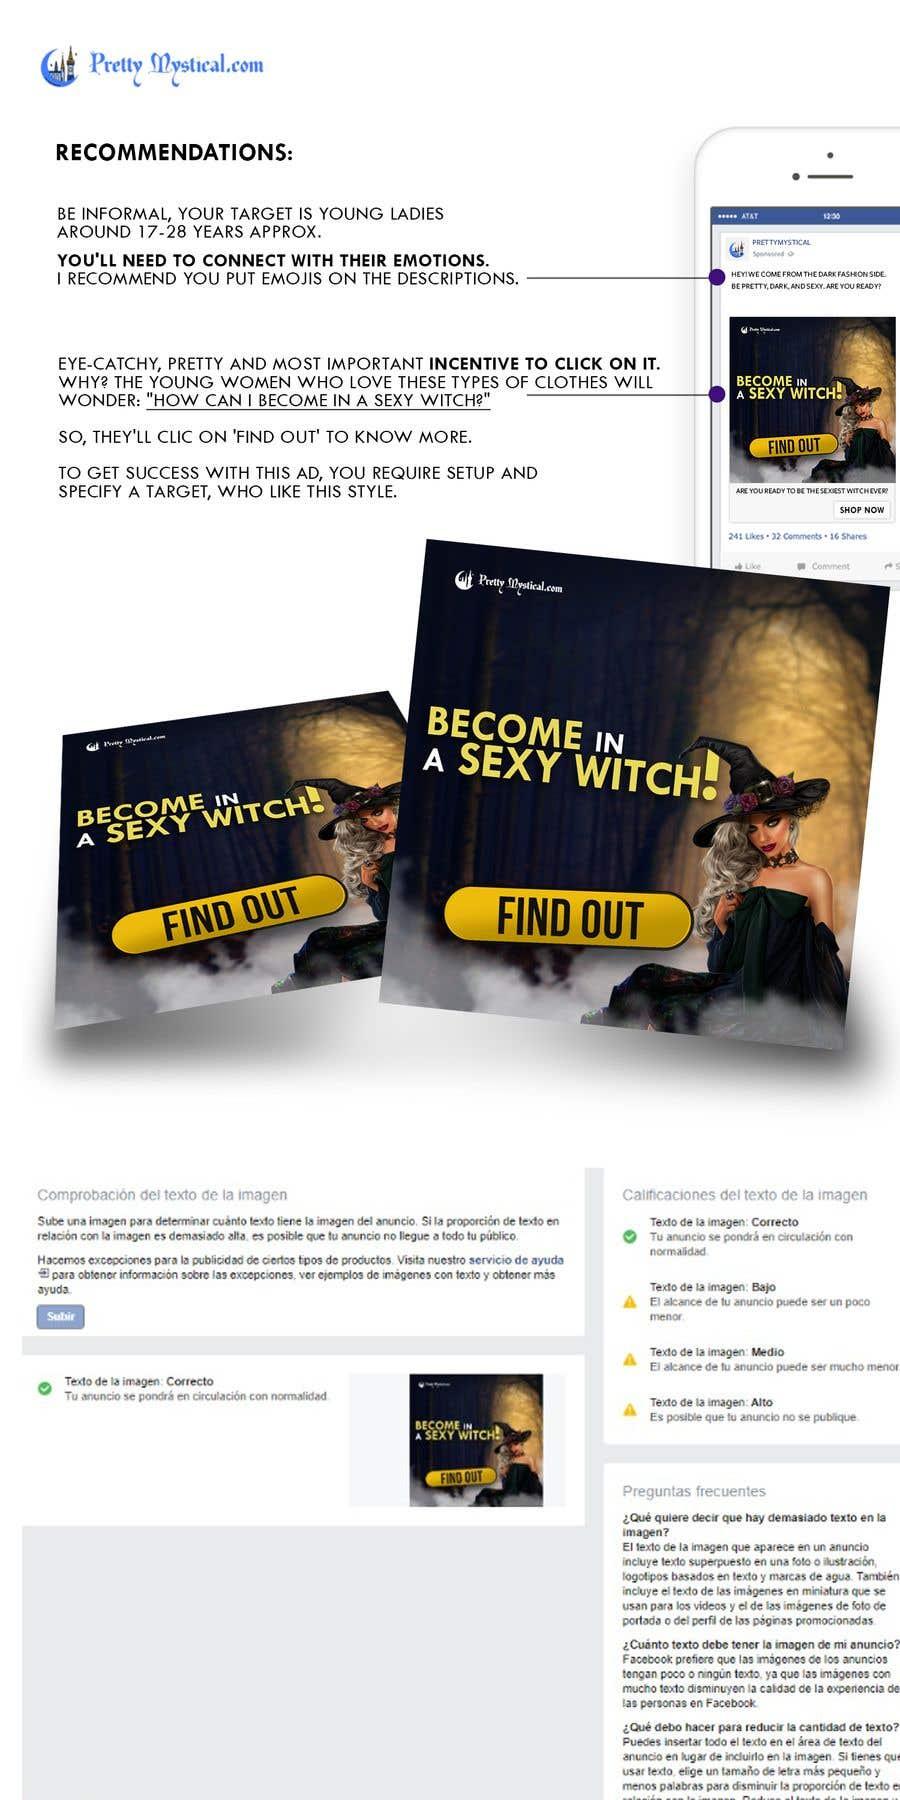 Penyertaan Peraduan #                                        10                                      untuk                                         Facebook Advertisement Creative Contest - PrettyMystical.com